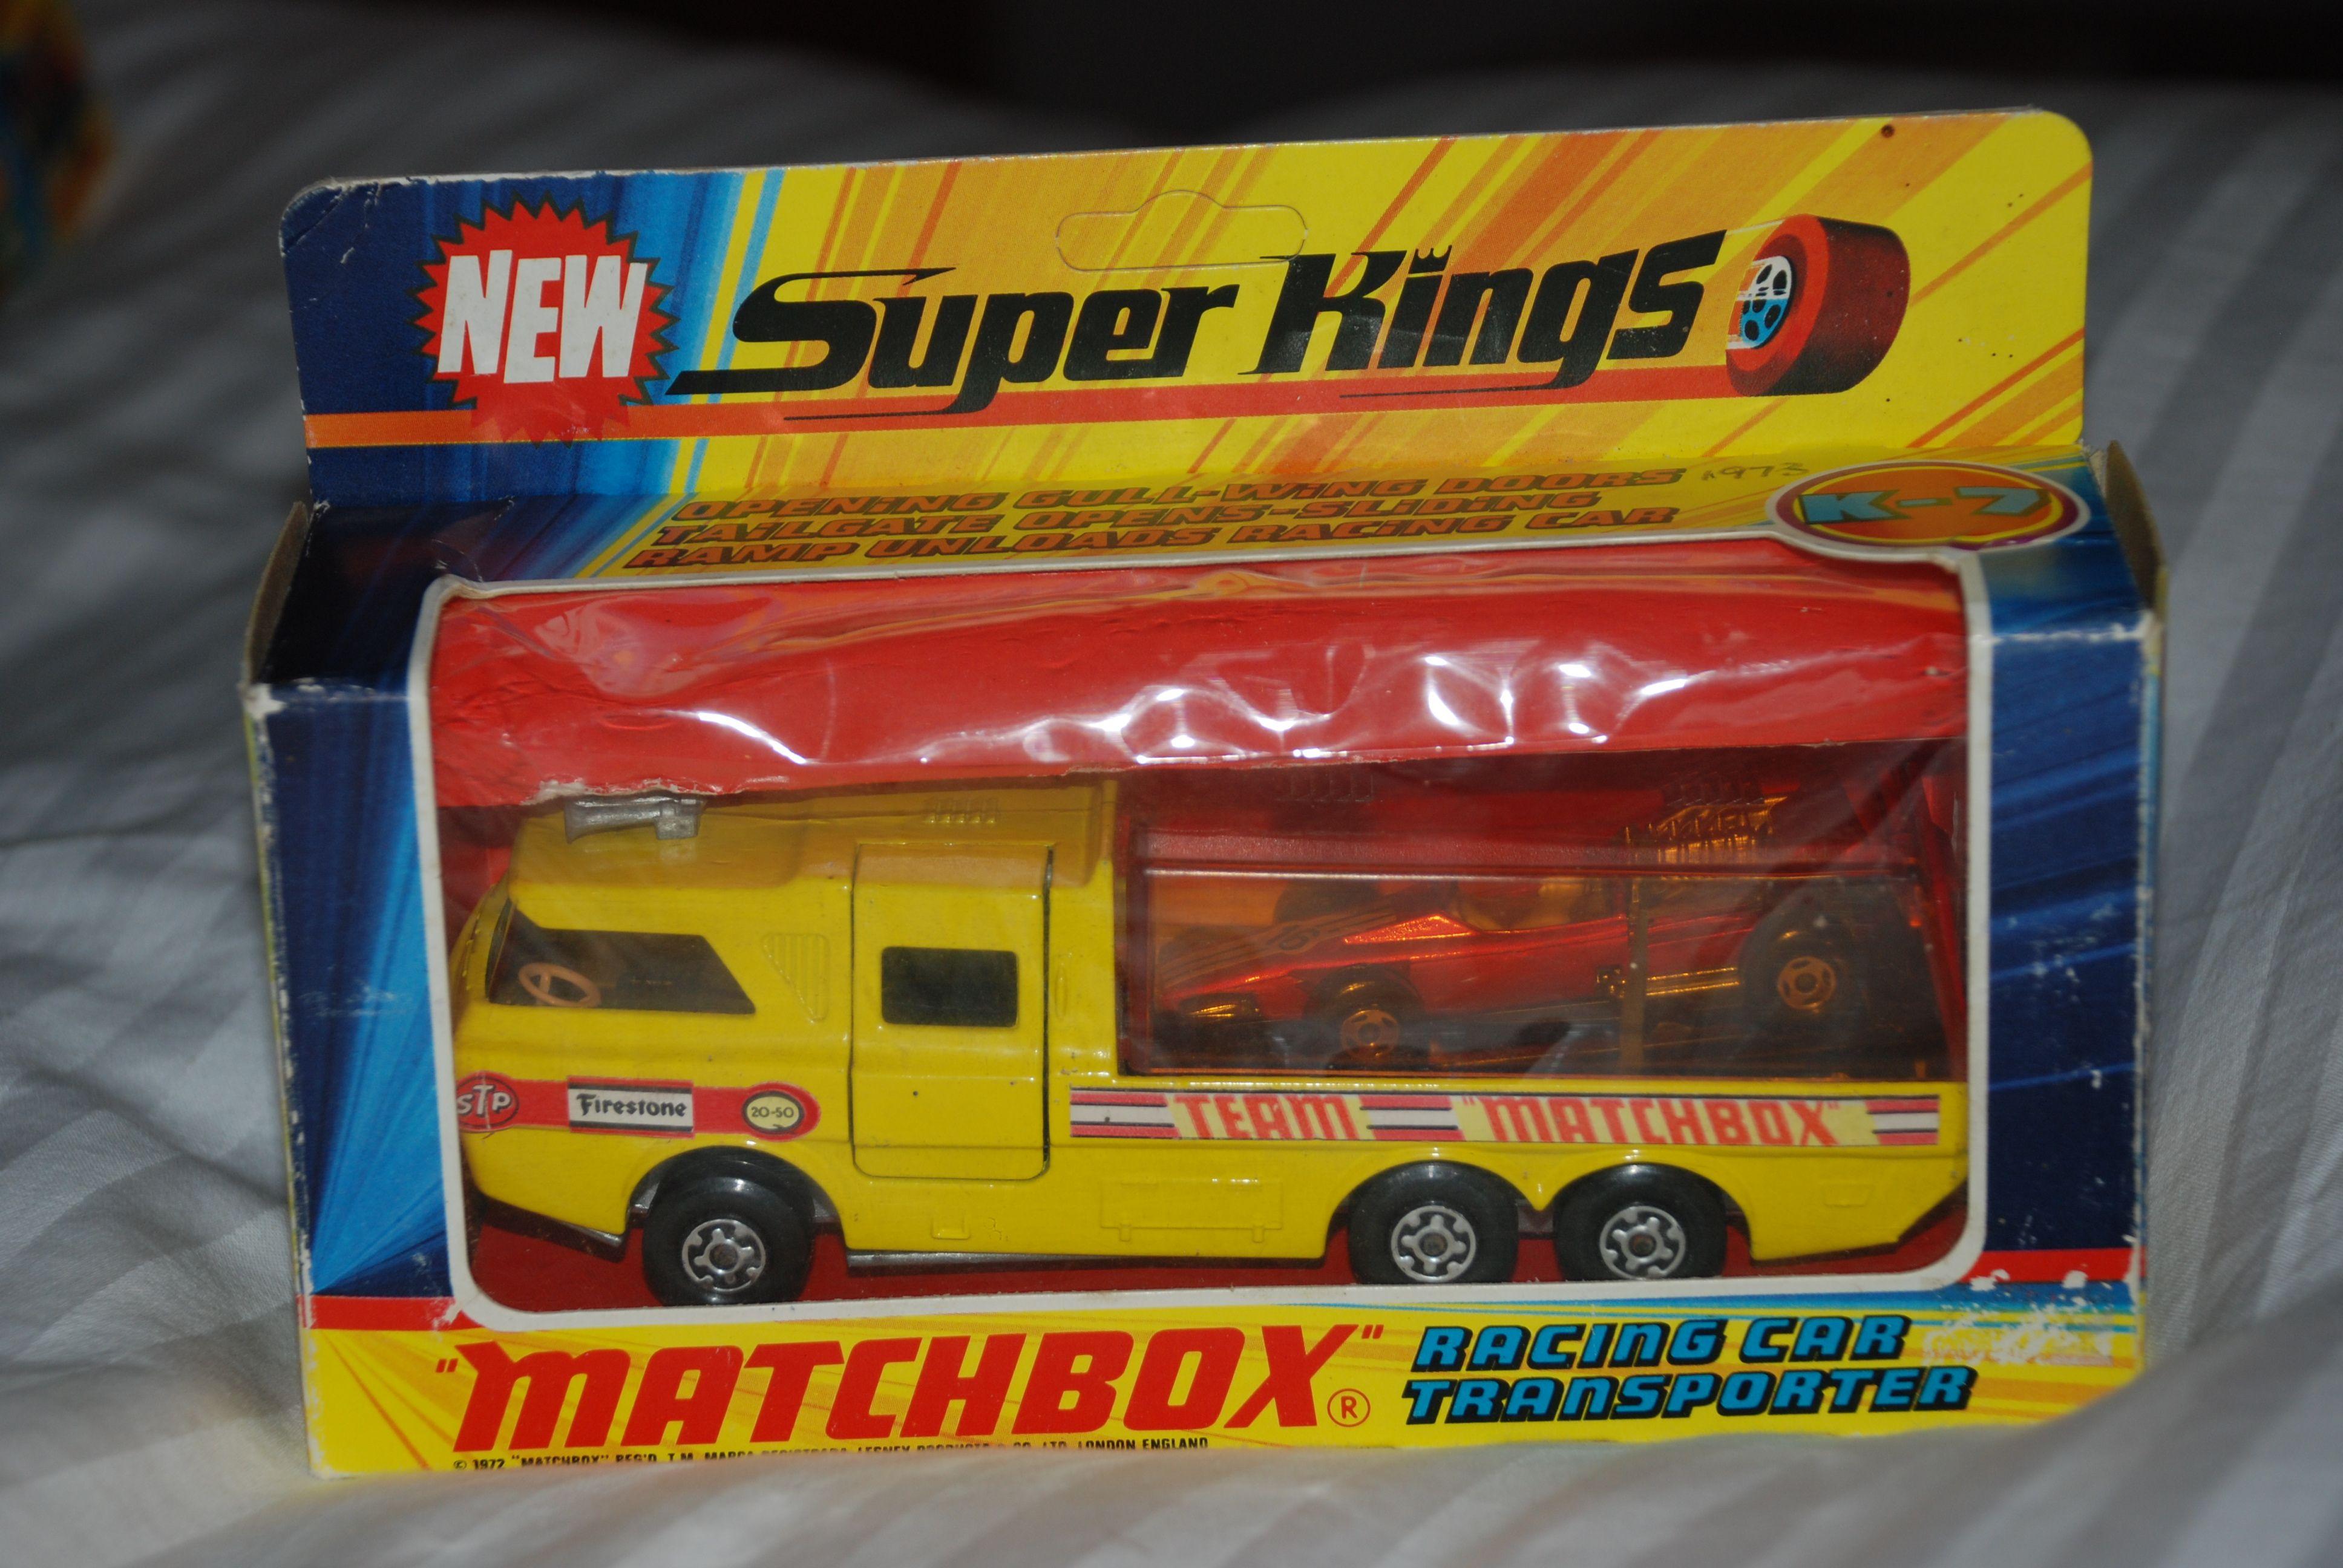 Superkings Toy Model Cars Matchbox Cars Matchbox